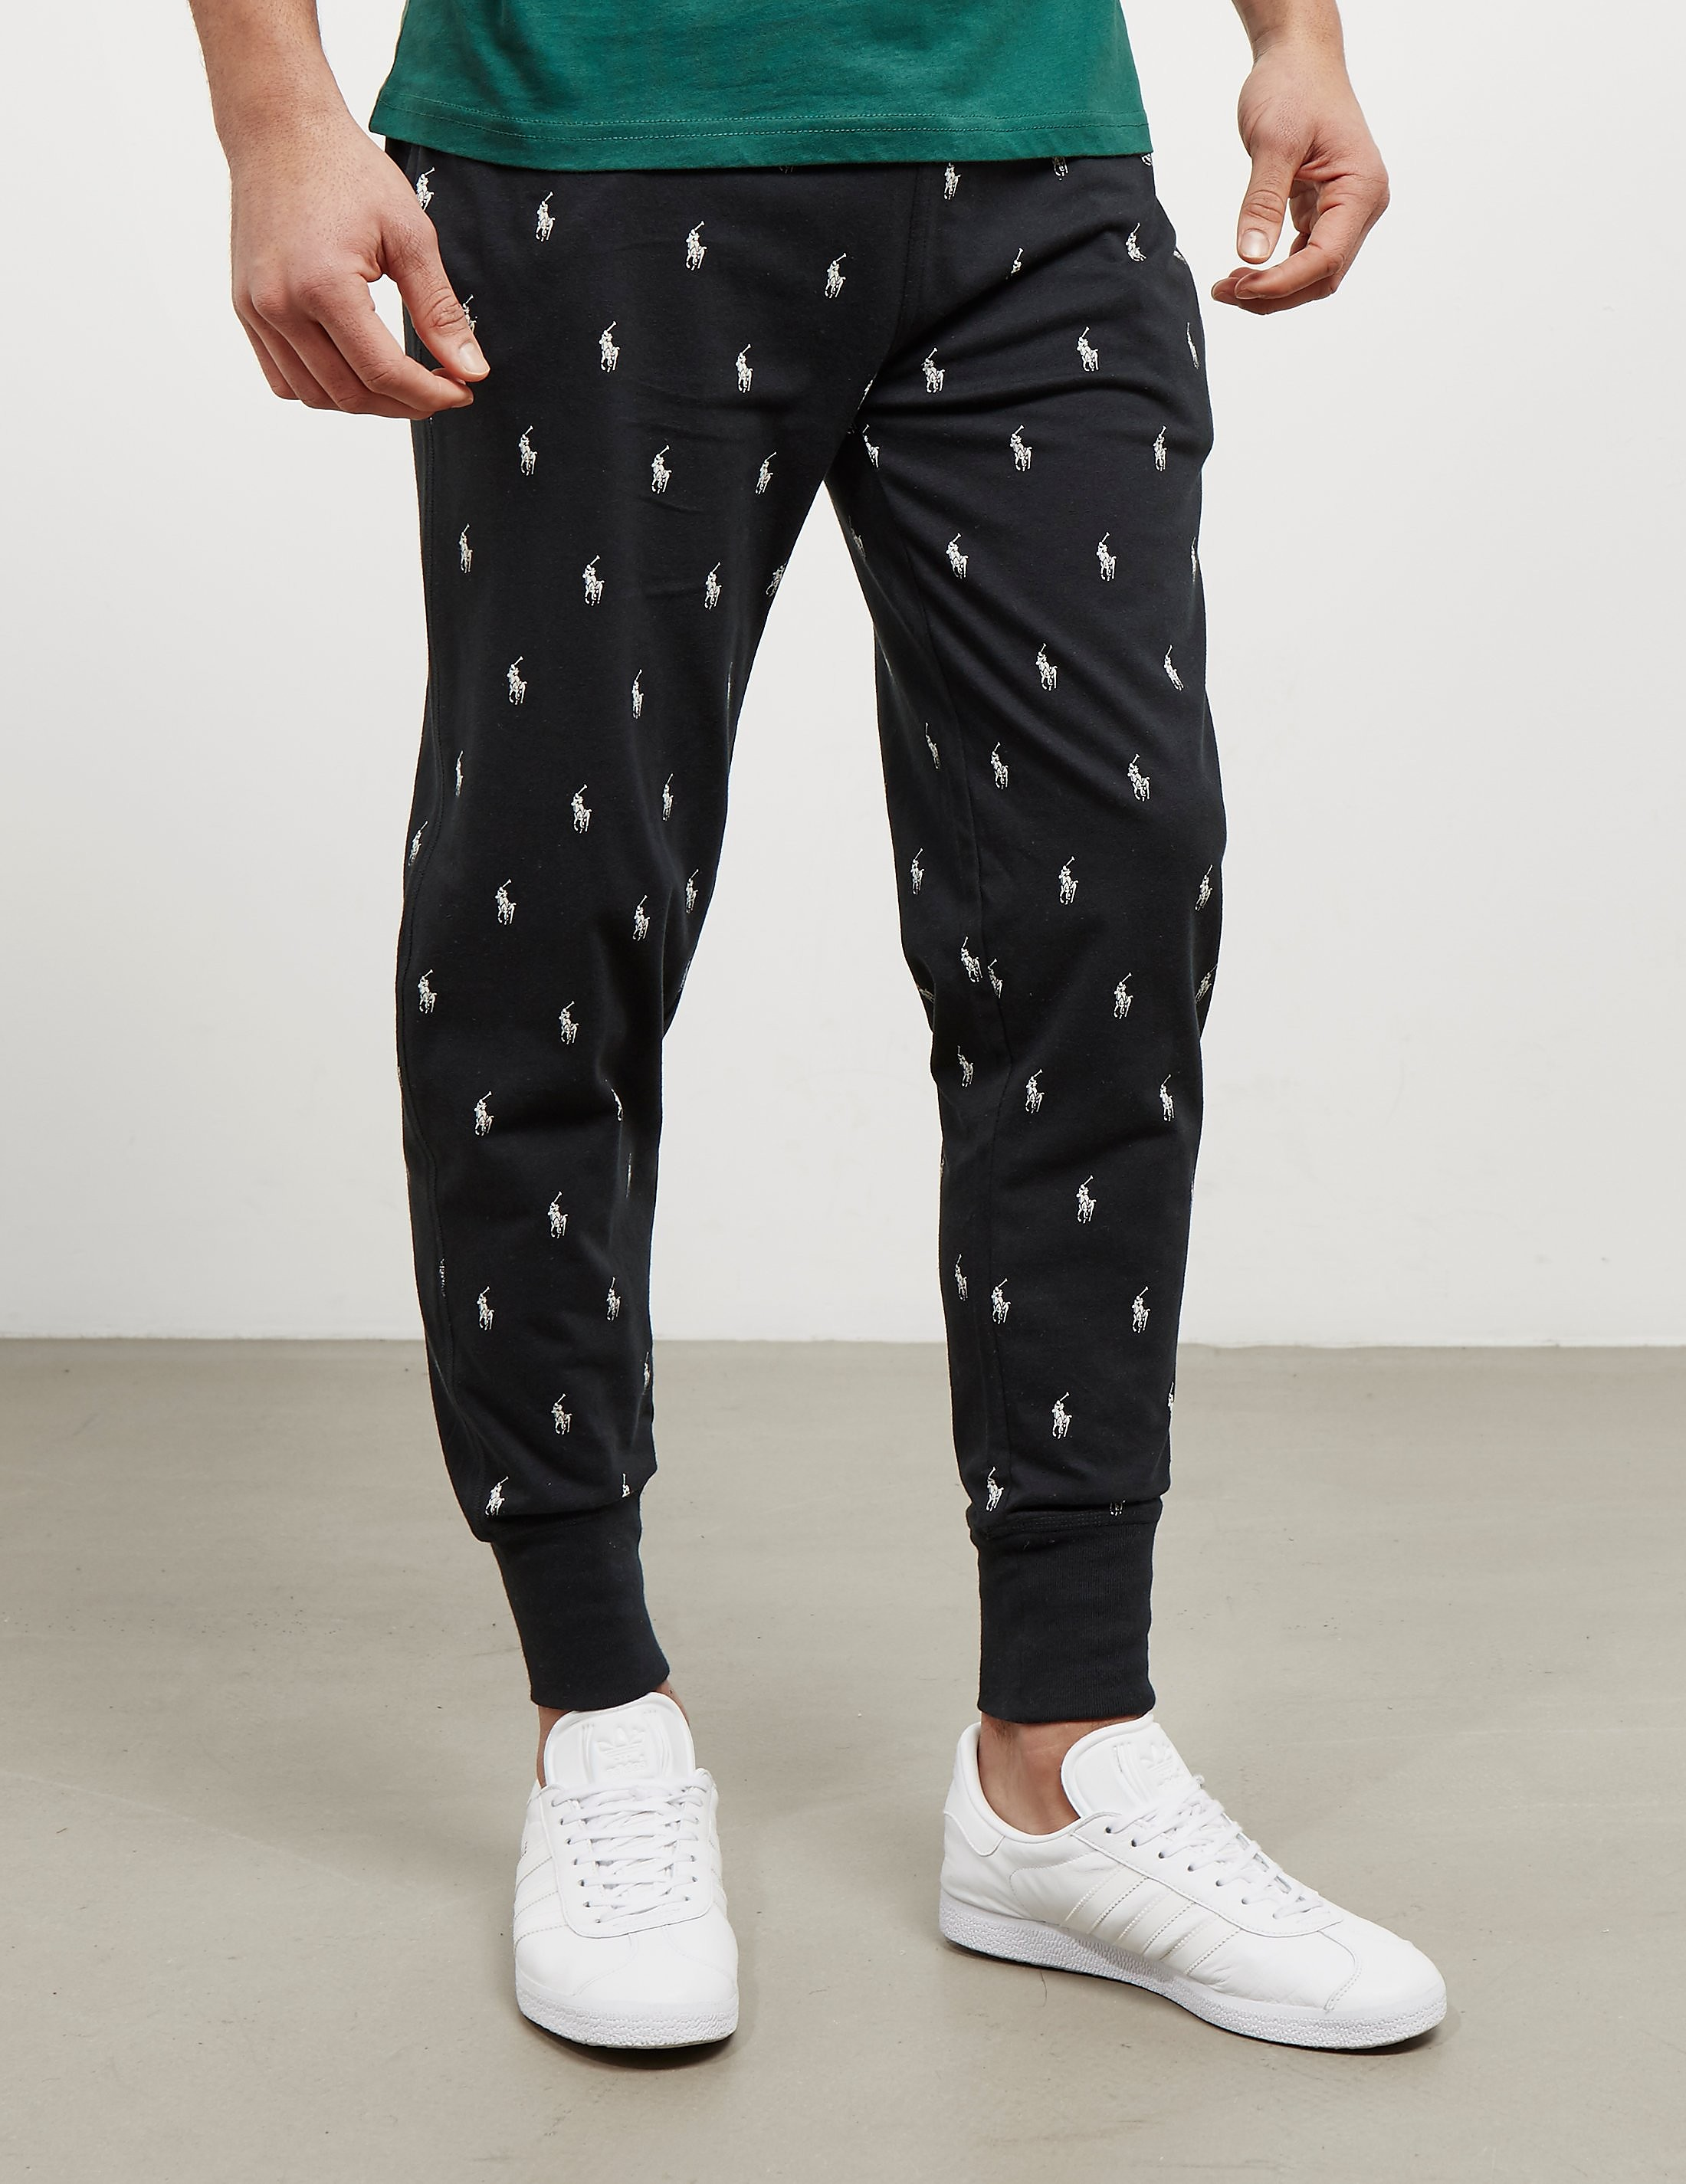 Polo Ralph Lauren All Over Print Track Pants